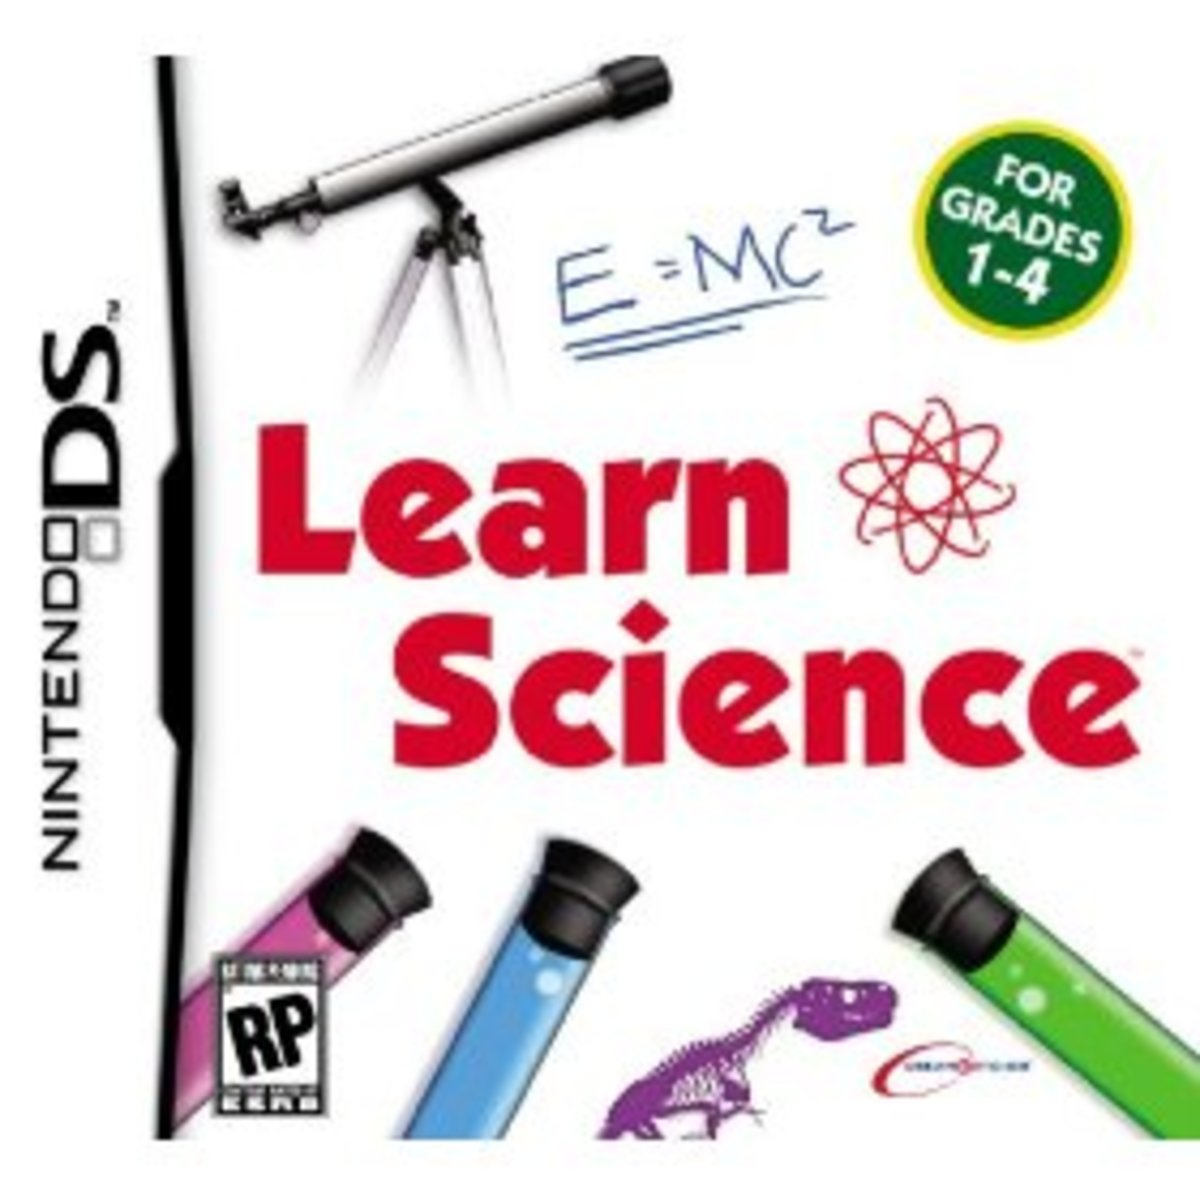 Learn on the Nintendo DSi